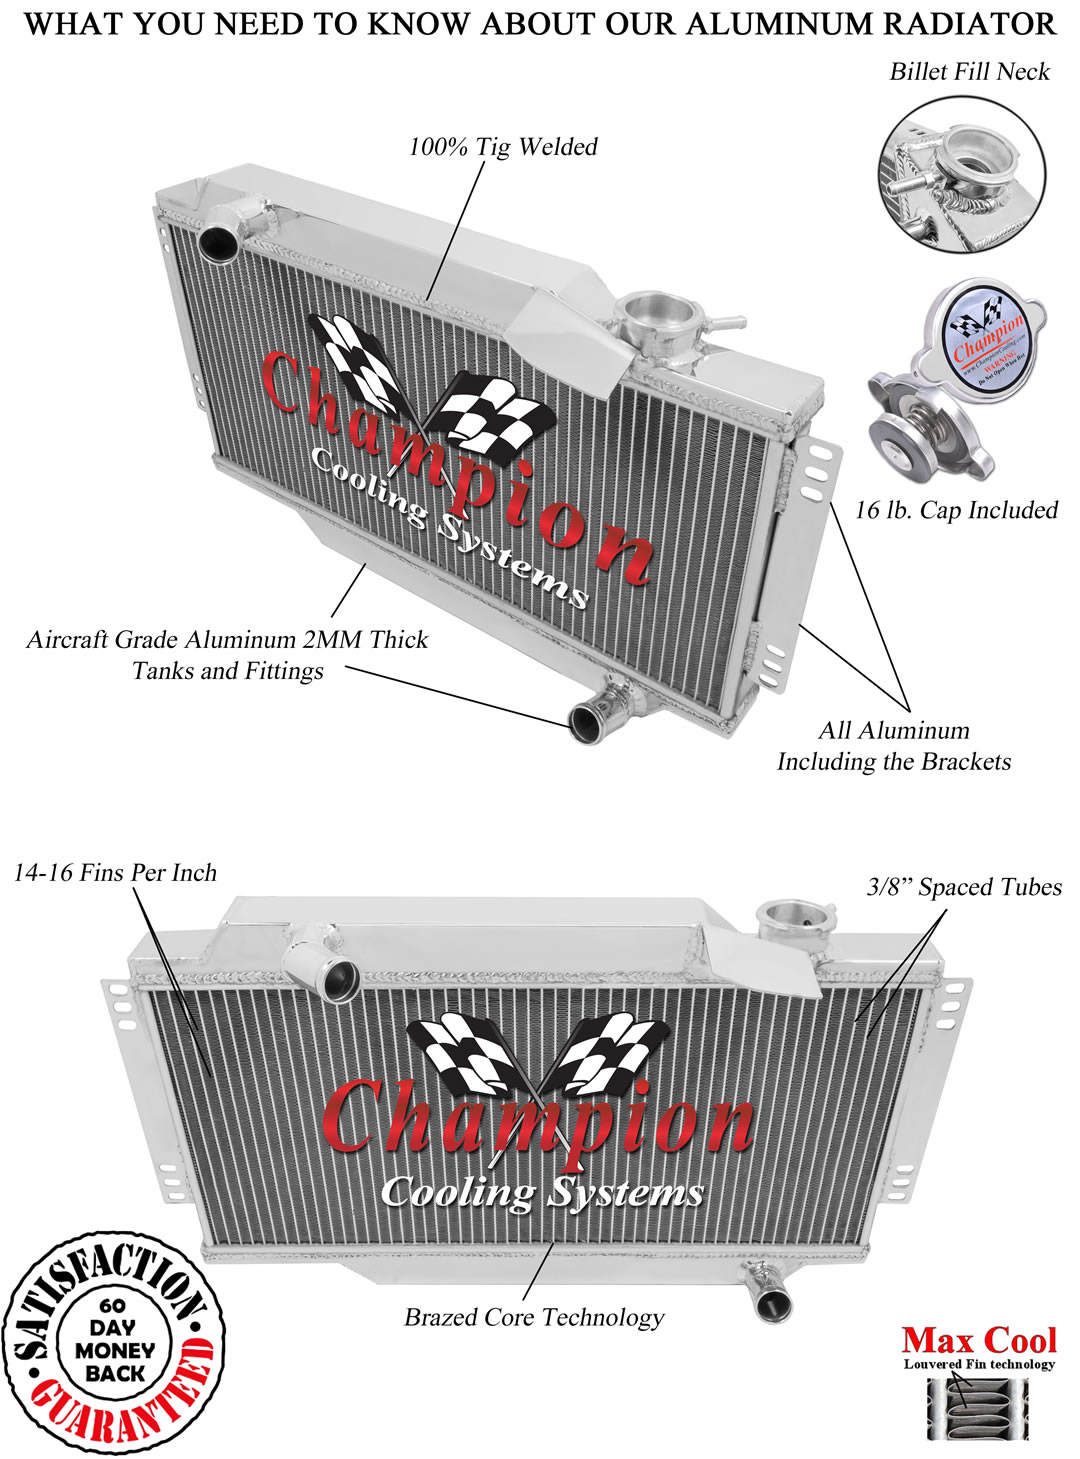 2 Row All Aluminum Champion Alliant Radiator For 1964-78 Triumph Spitfire